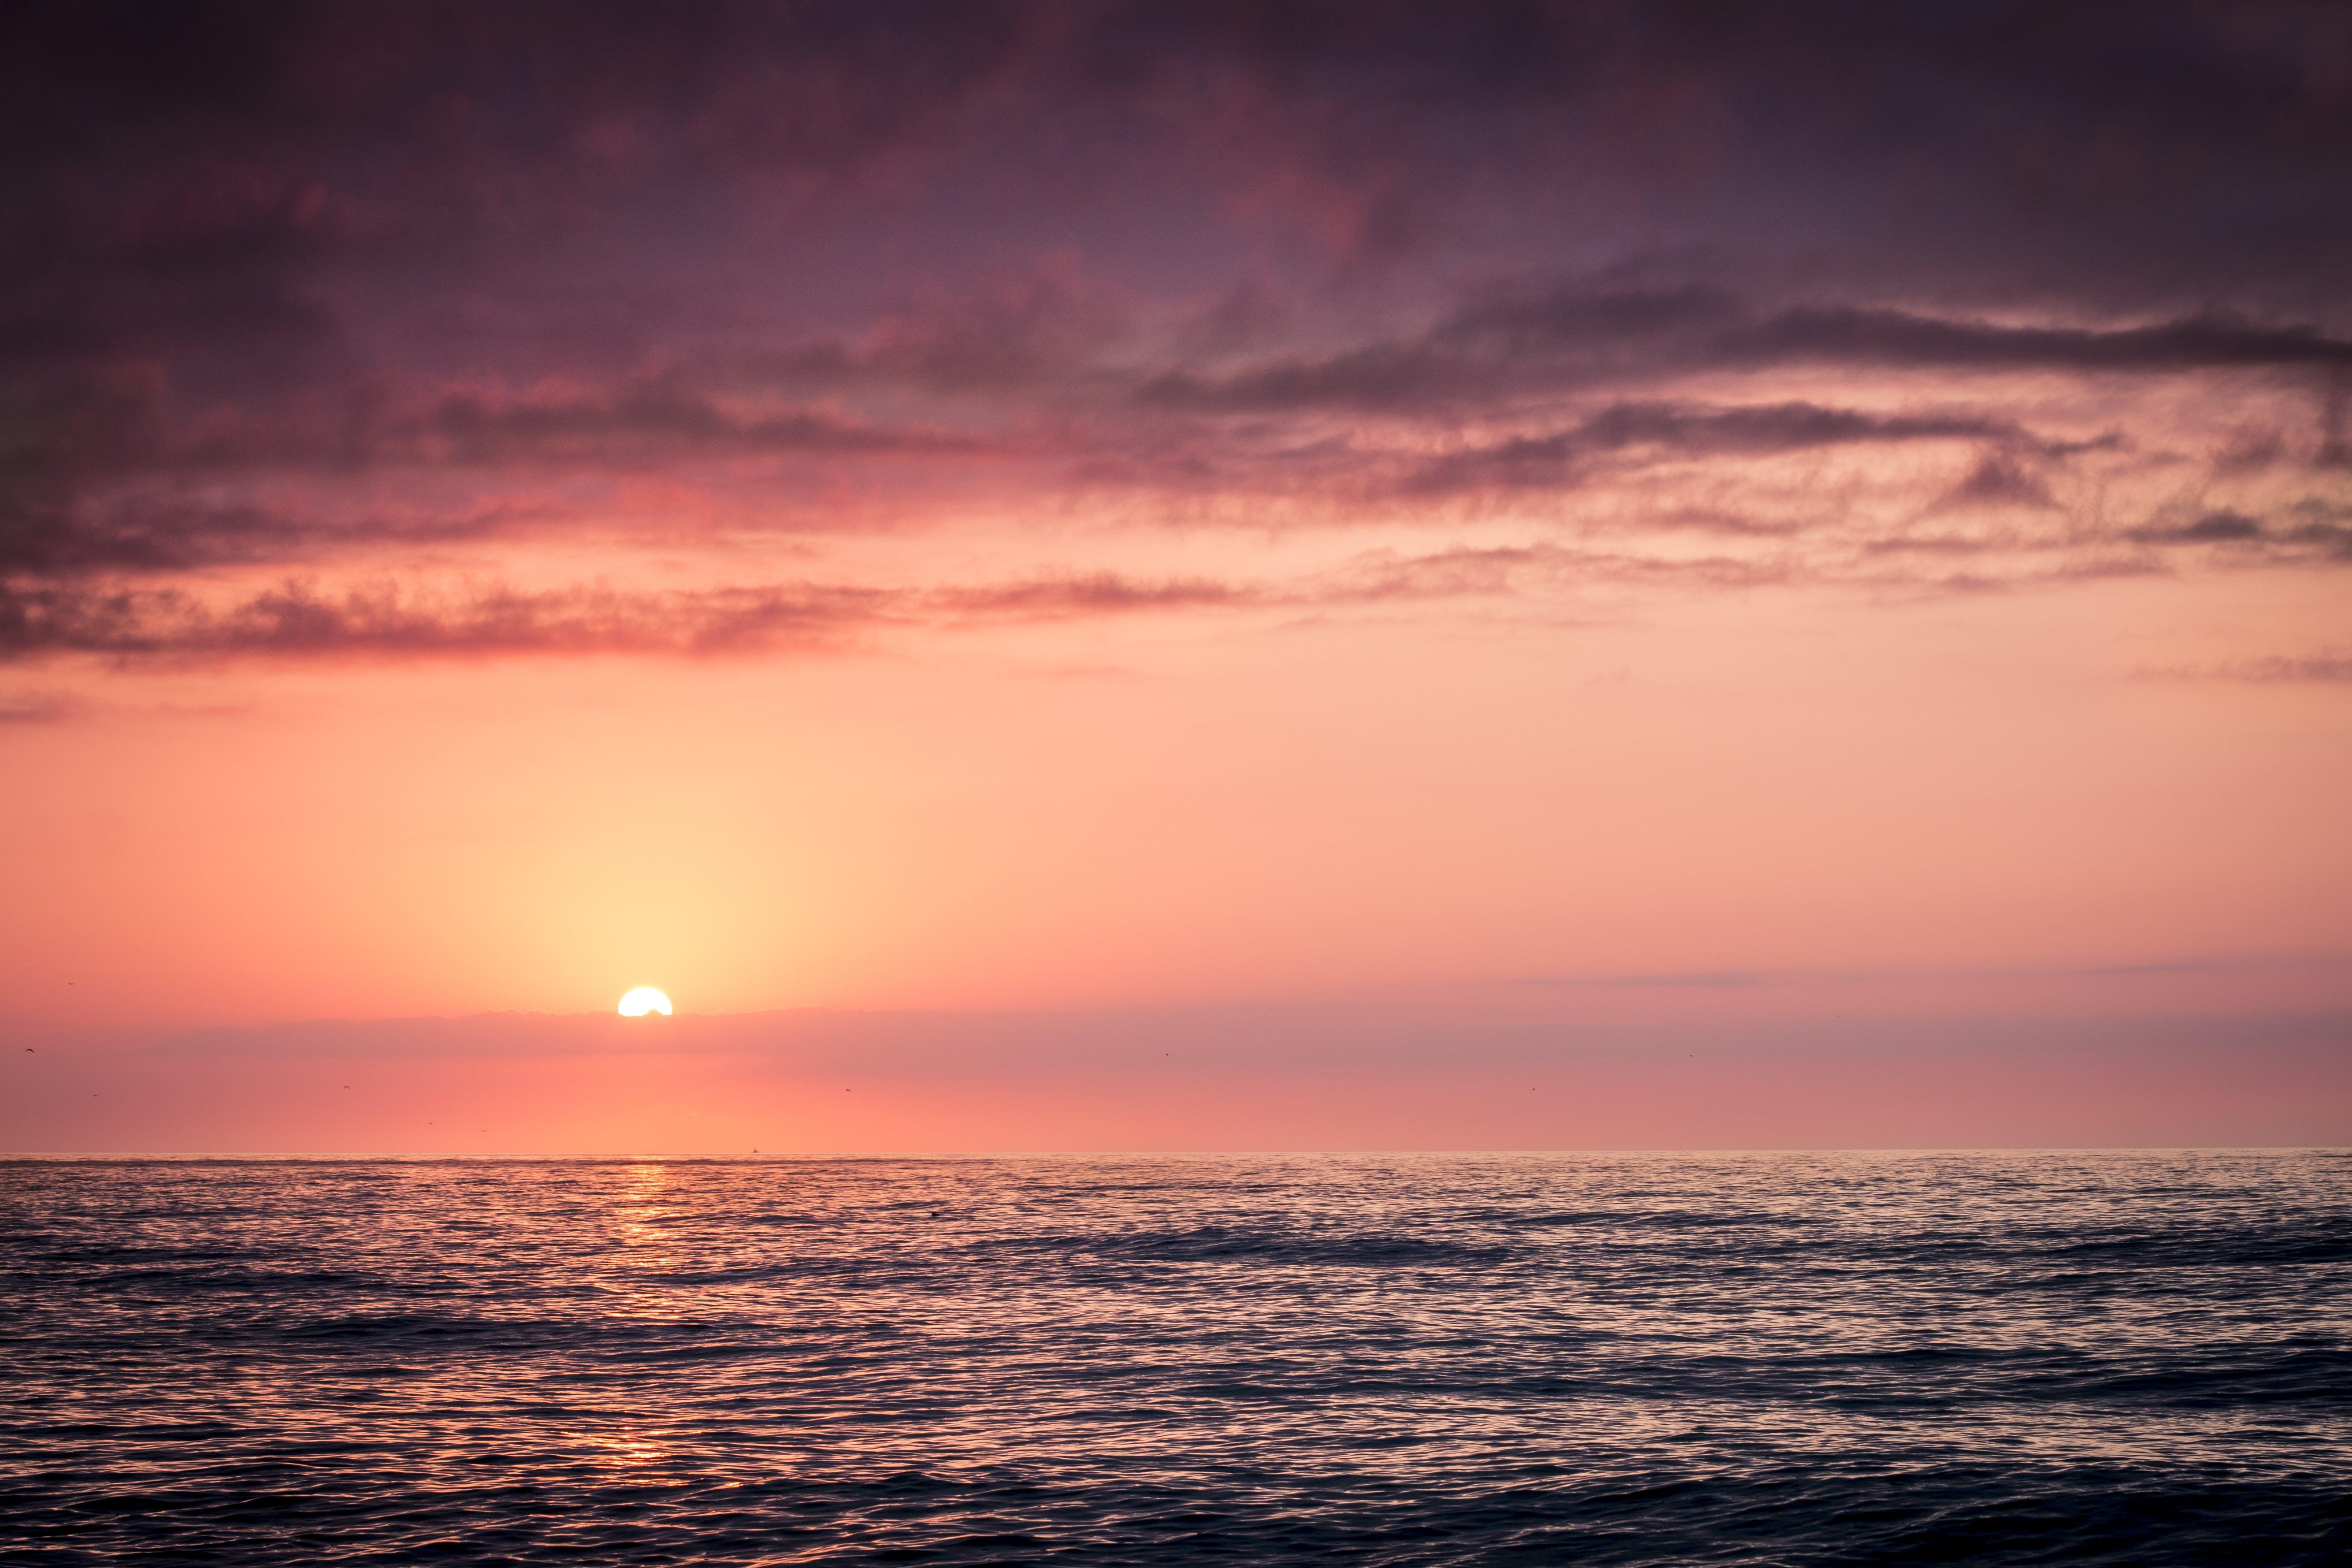 Free stock photo of sea, nature, sunset, water